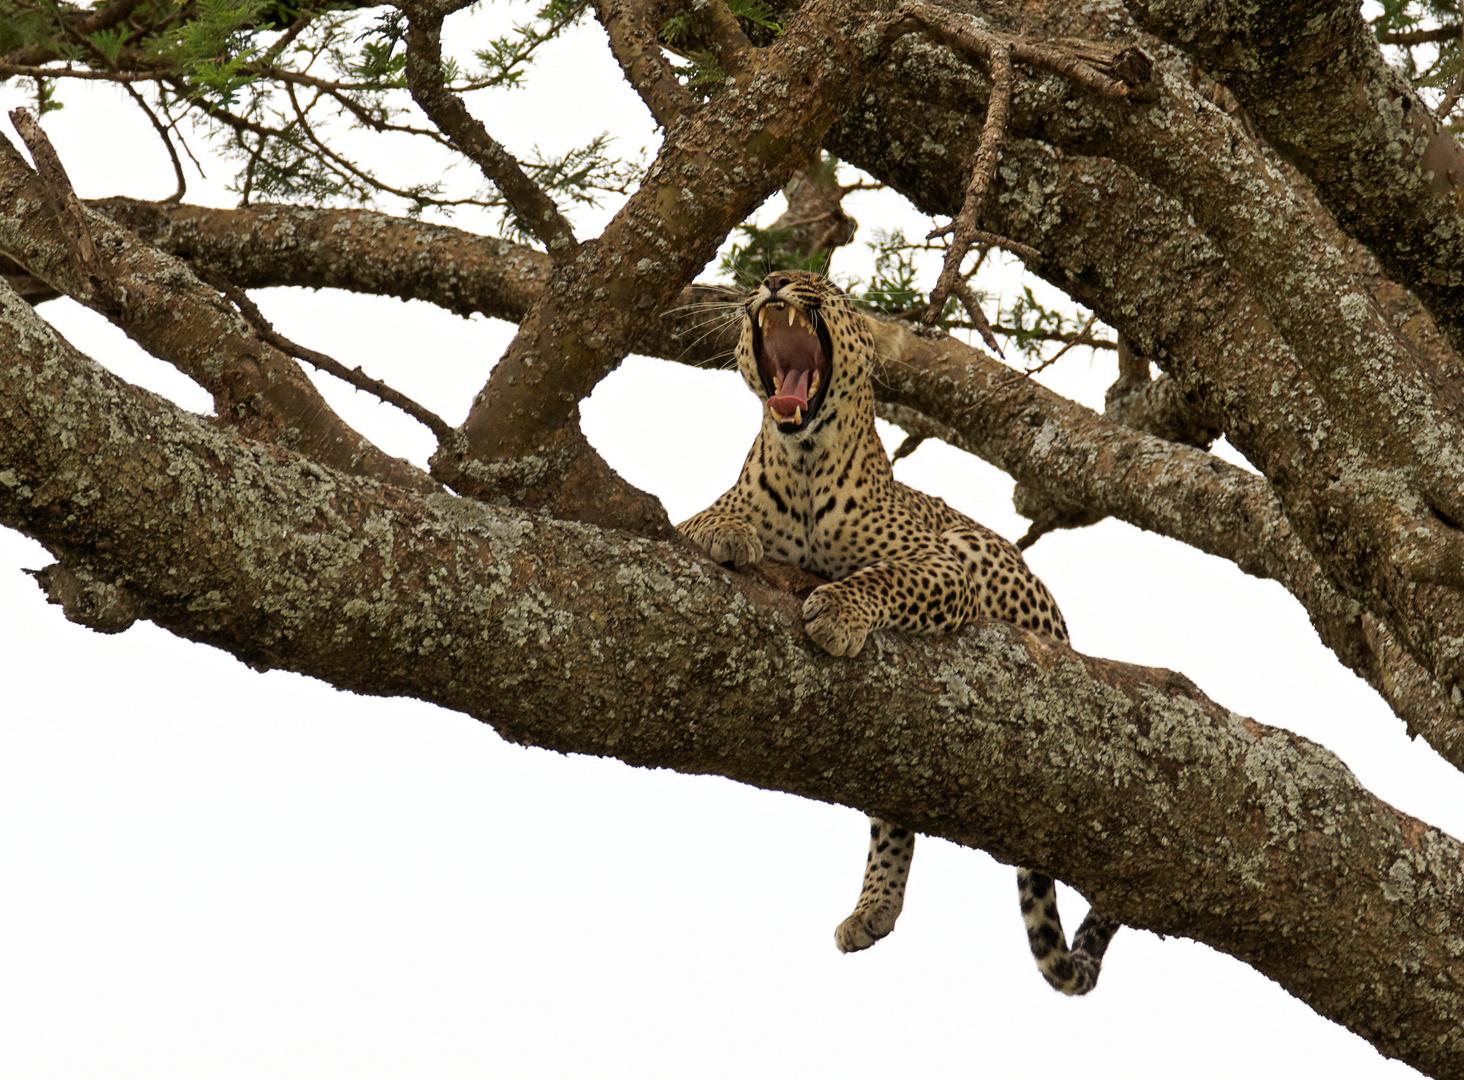 Leopard, Serengeti 2013